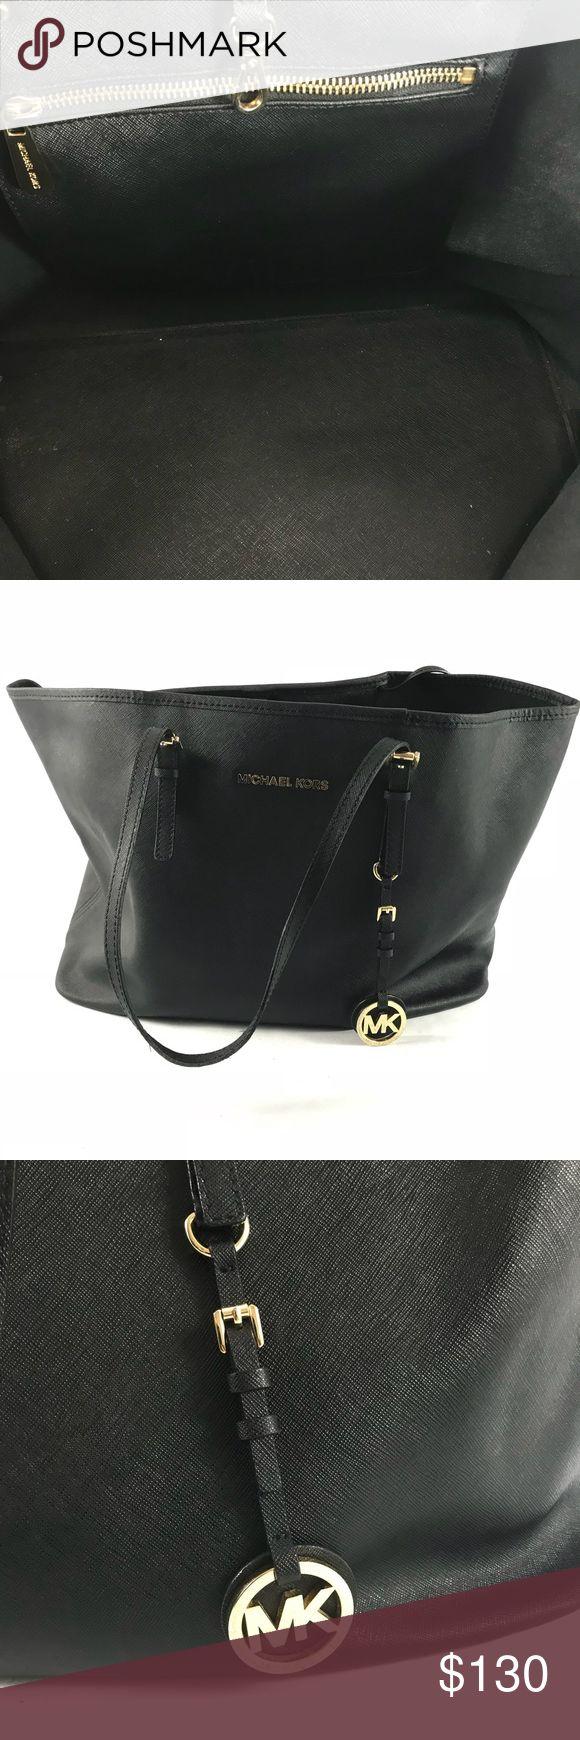 Michael Kors large Black tote bag Pre-owned Michael Kors large Black tote bag.  See pictures for condition.  Great condition. Classic handbag. Michael Kors Bags Totes